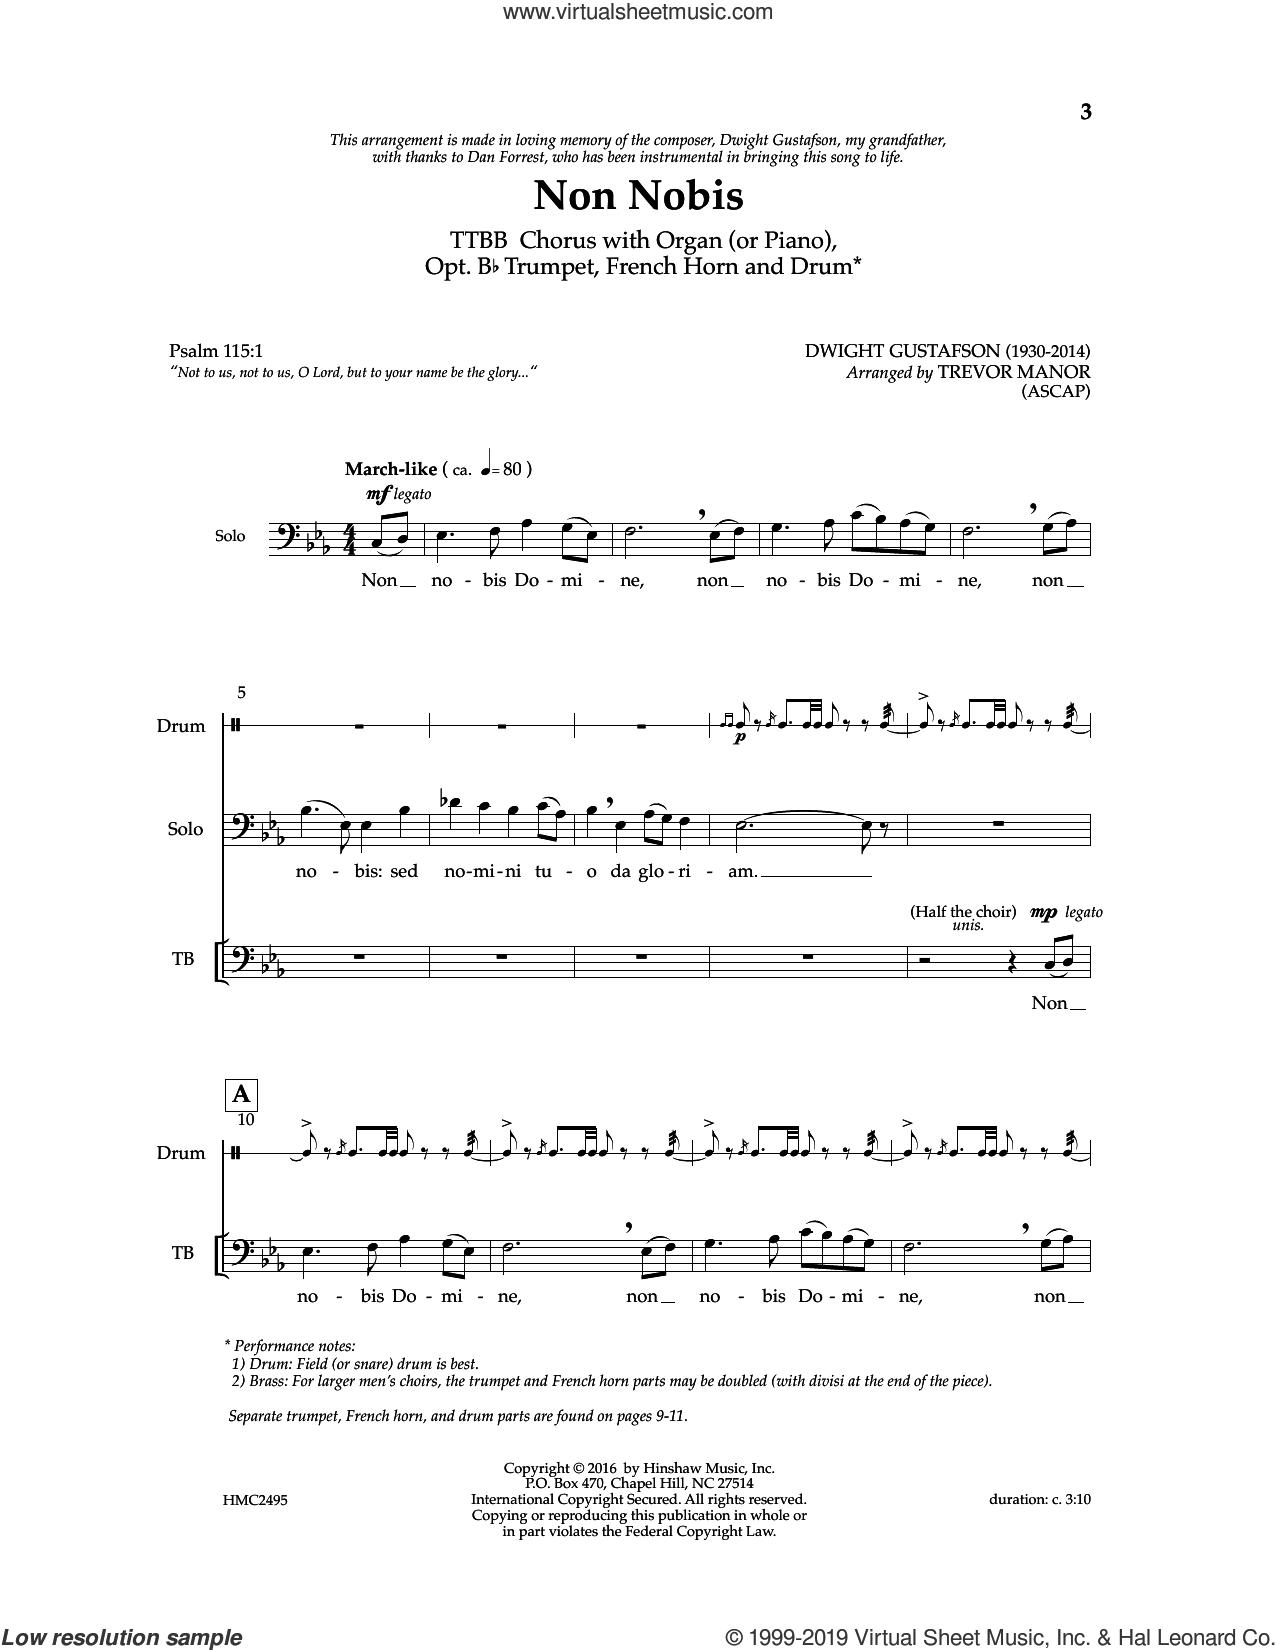 Non Nobis (arr. Trevor Manor) sheet music for choir (TTBB: tenor, bass) by Dwight Gustafson and Trevor Manor, intermediate skill level